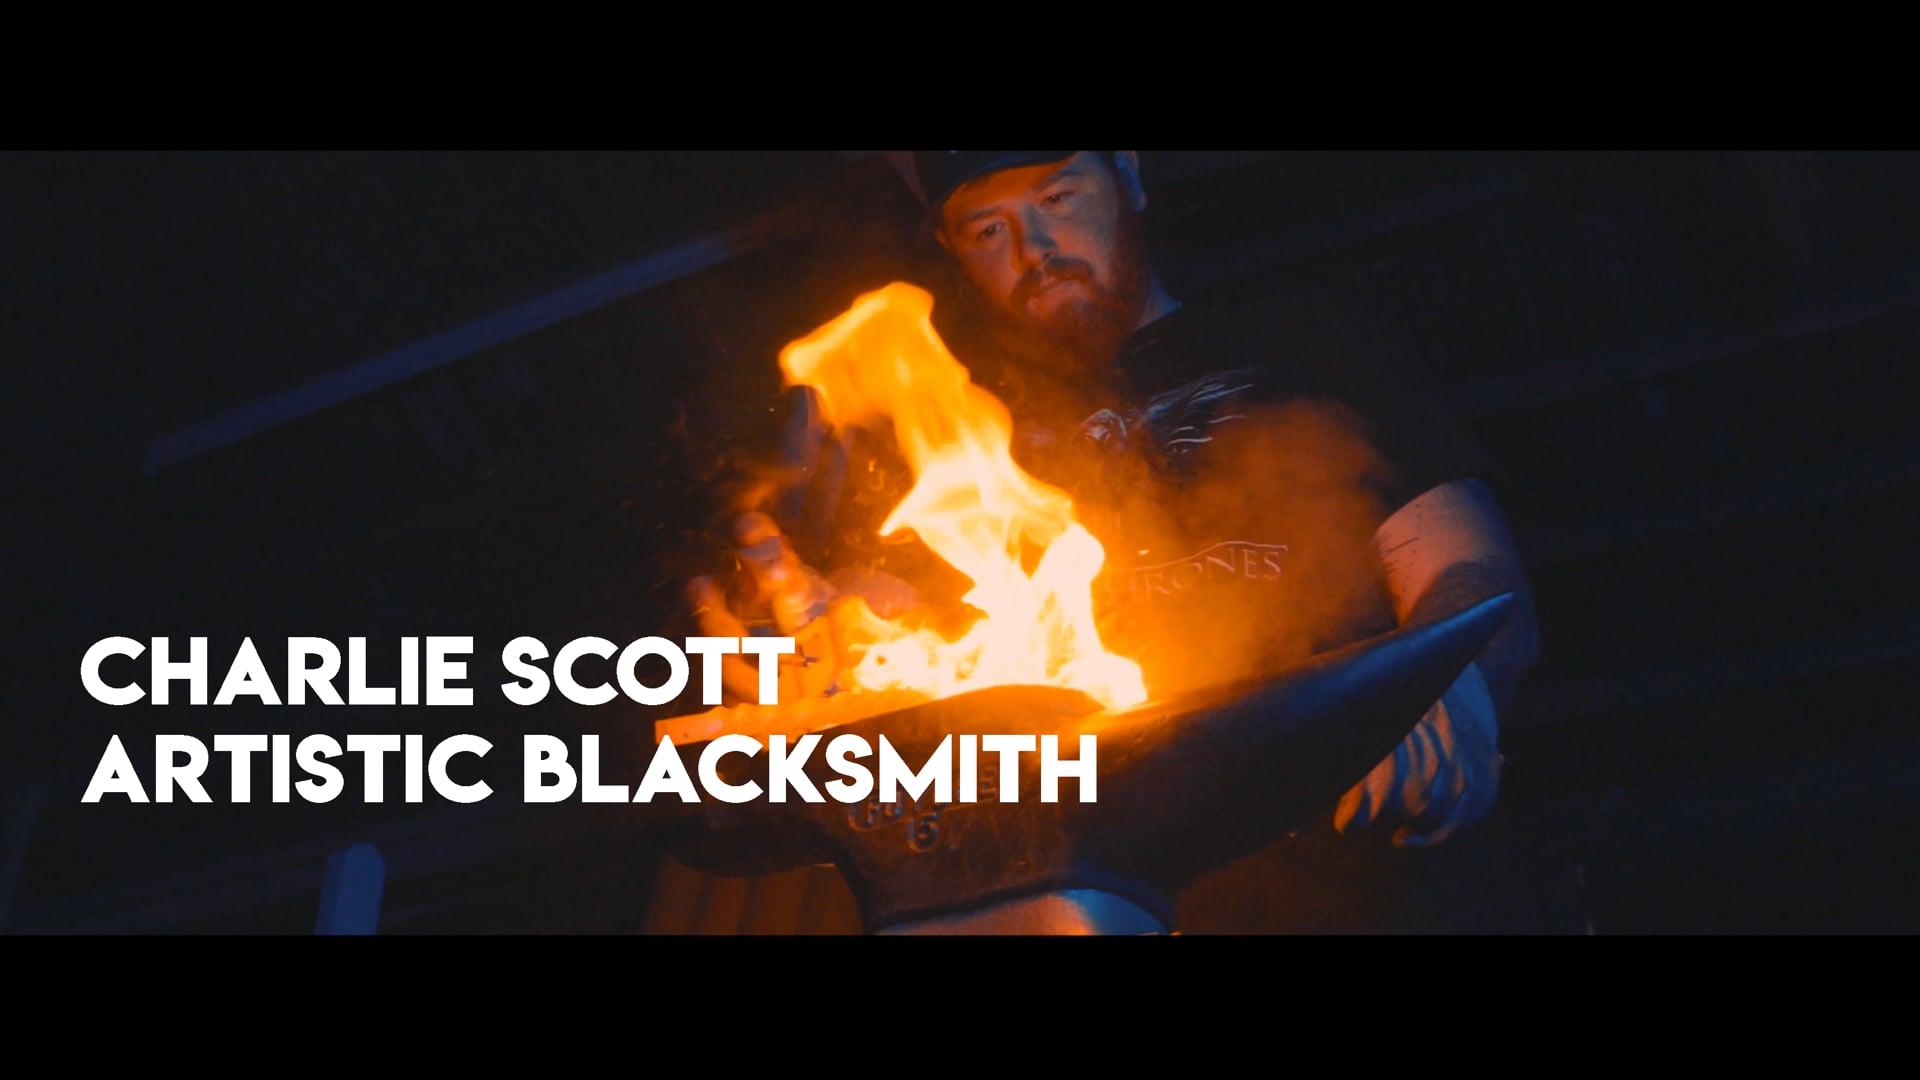 Charlie Scott - Artistic Blacksmith